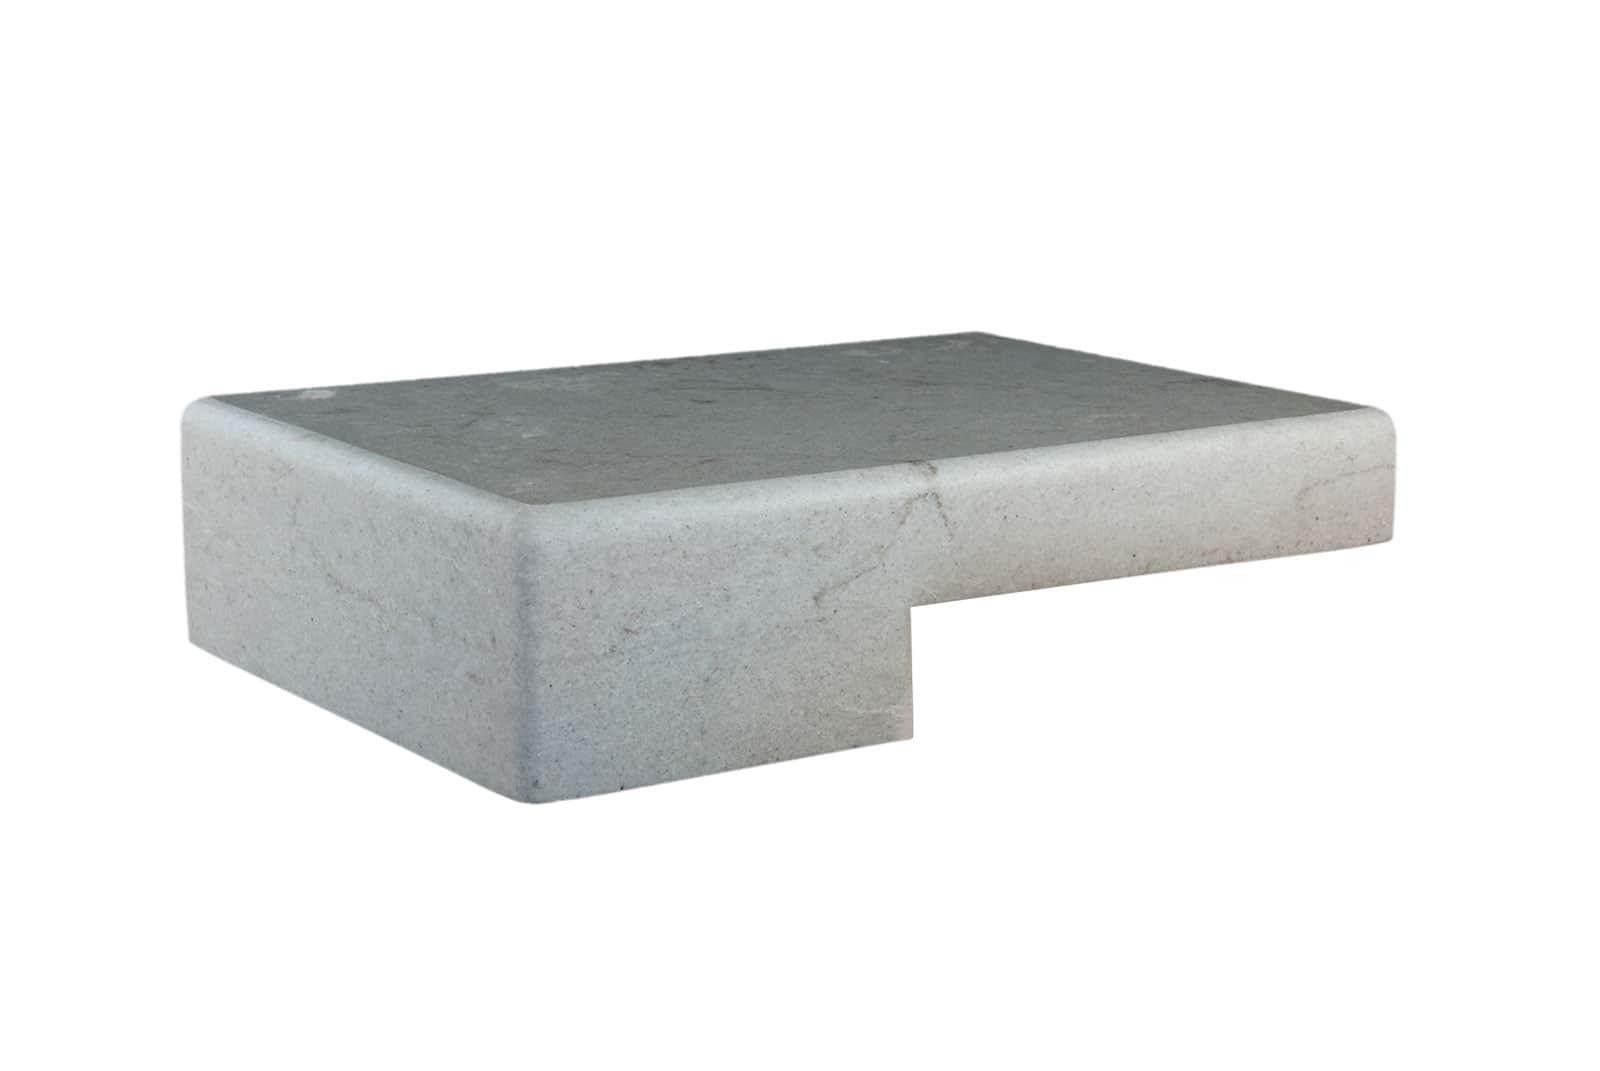 artistic-granite-designs-edges-fabrications-1_5-eased-bevel-6078